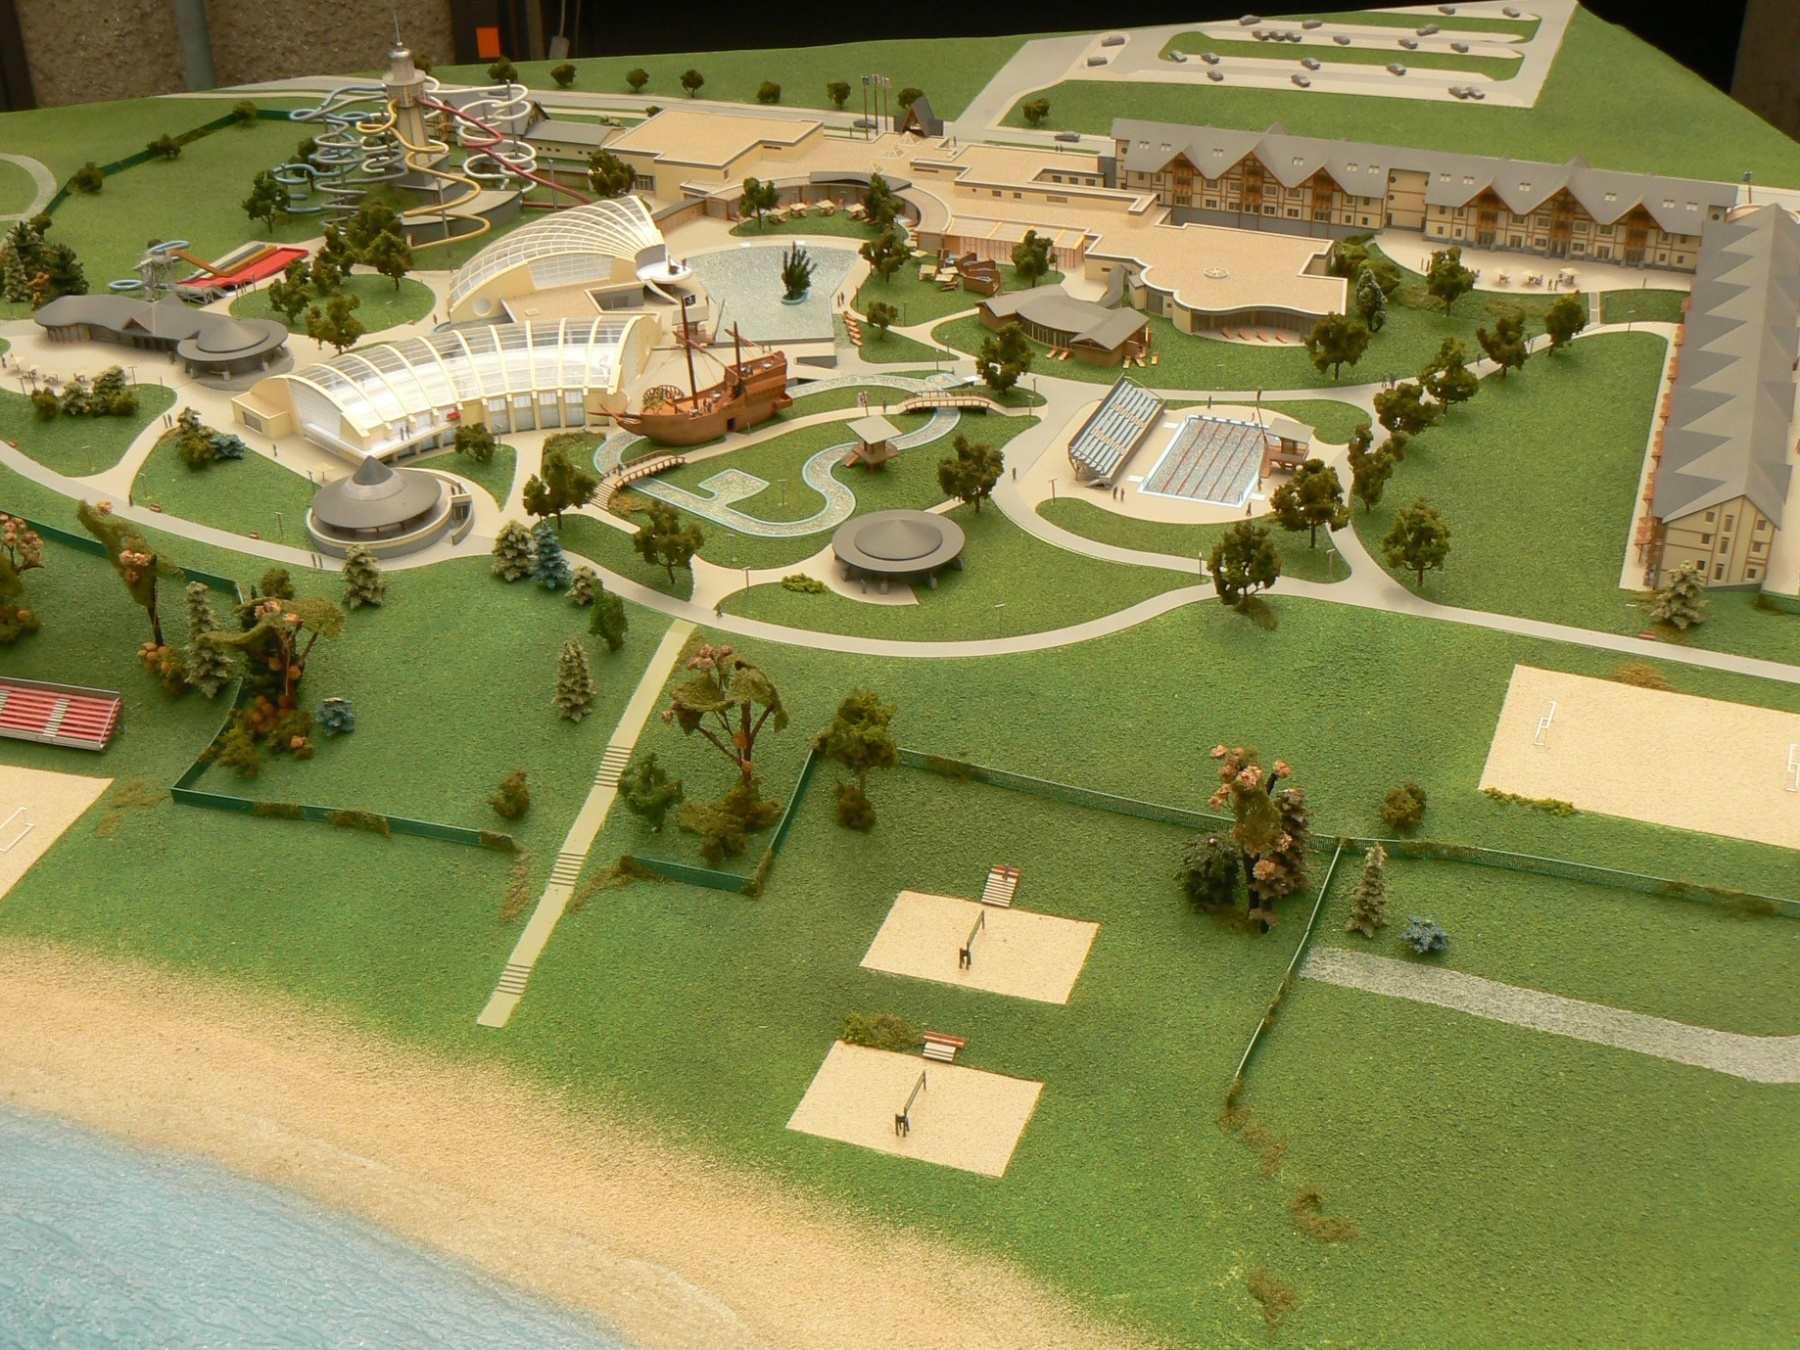 Realizace aquaparku Gino Paradise Tbilisi v daleké Gruzii zahájena